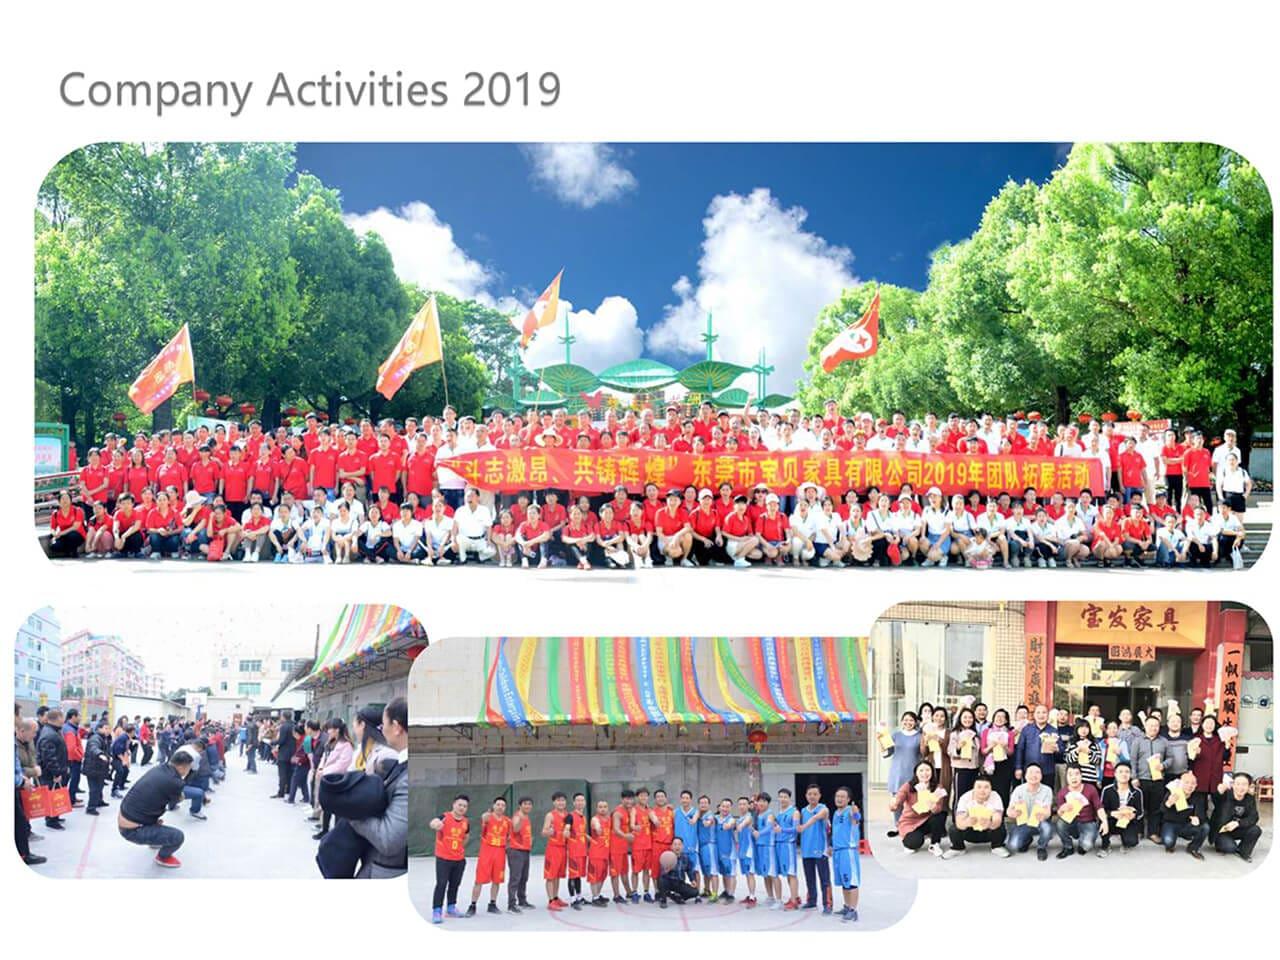 4.Company Actitives